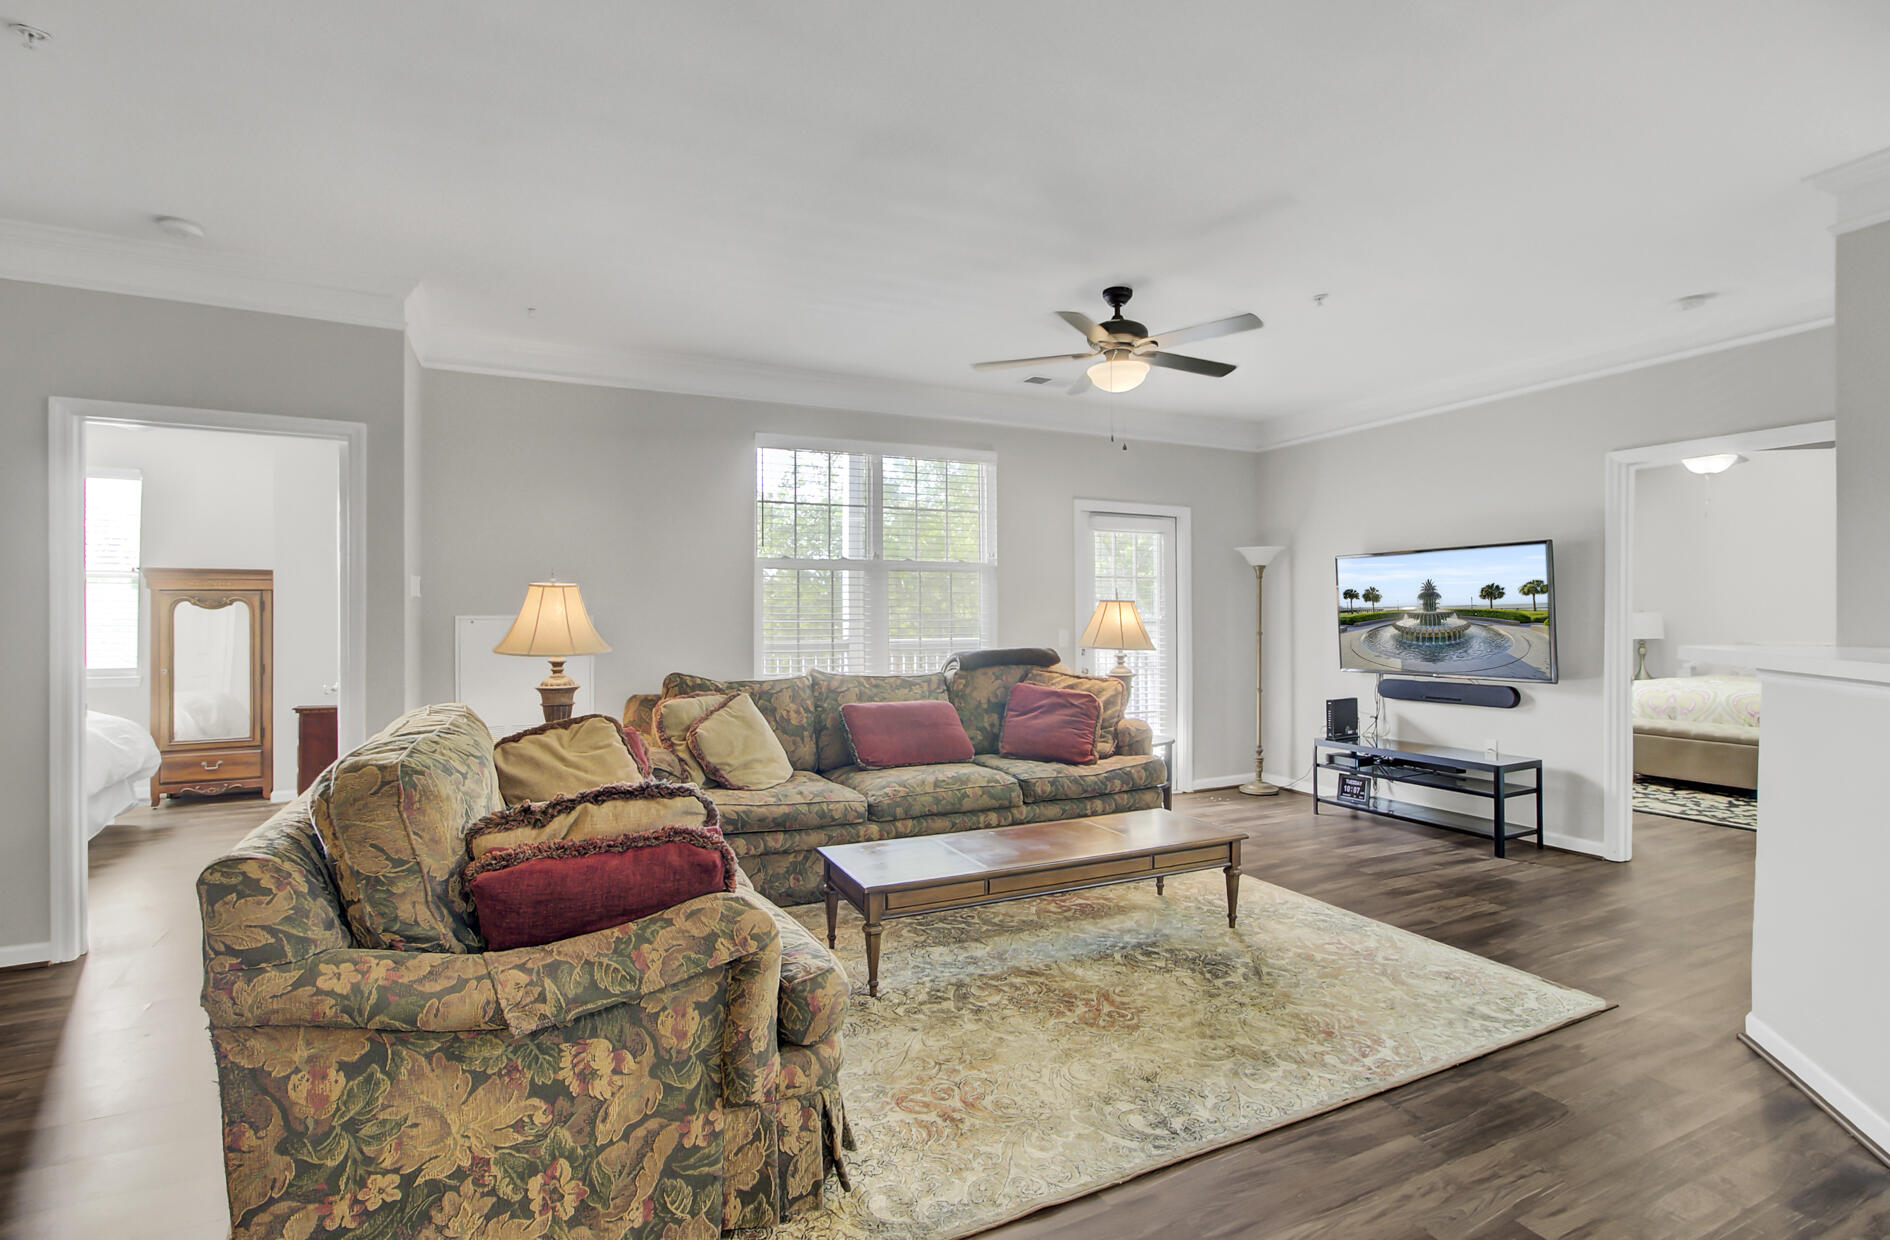 Cambridge Lakes Homes For Sale - 1485 Cambridge Lakes, Mount Pleasant, SC - 4